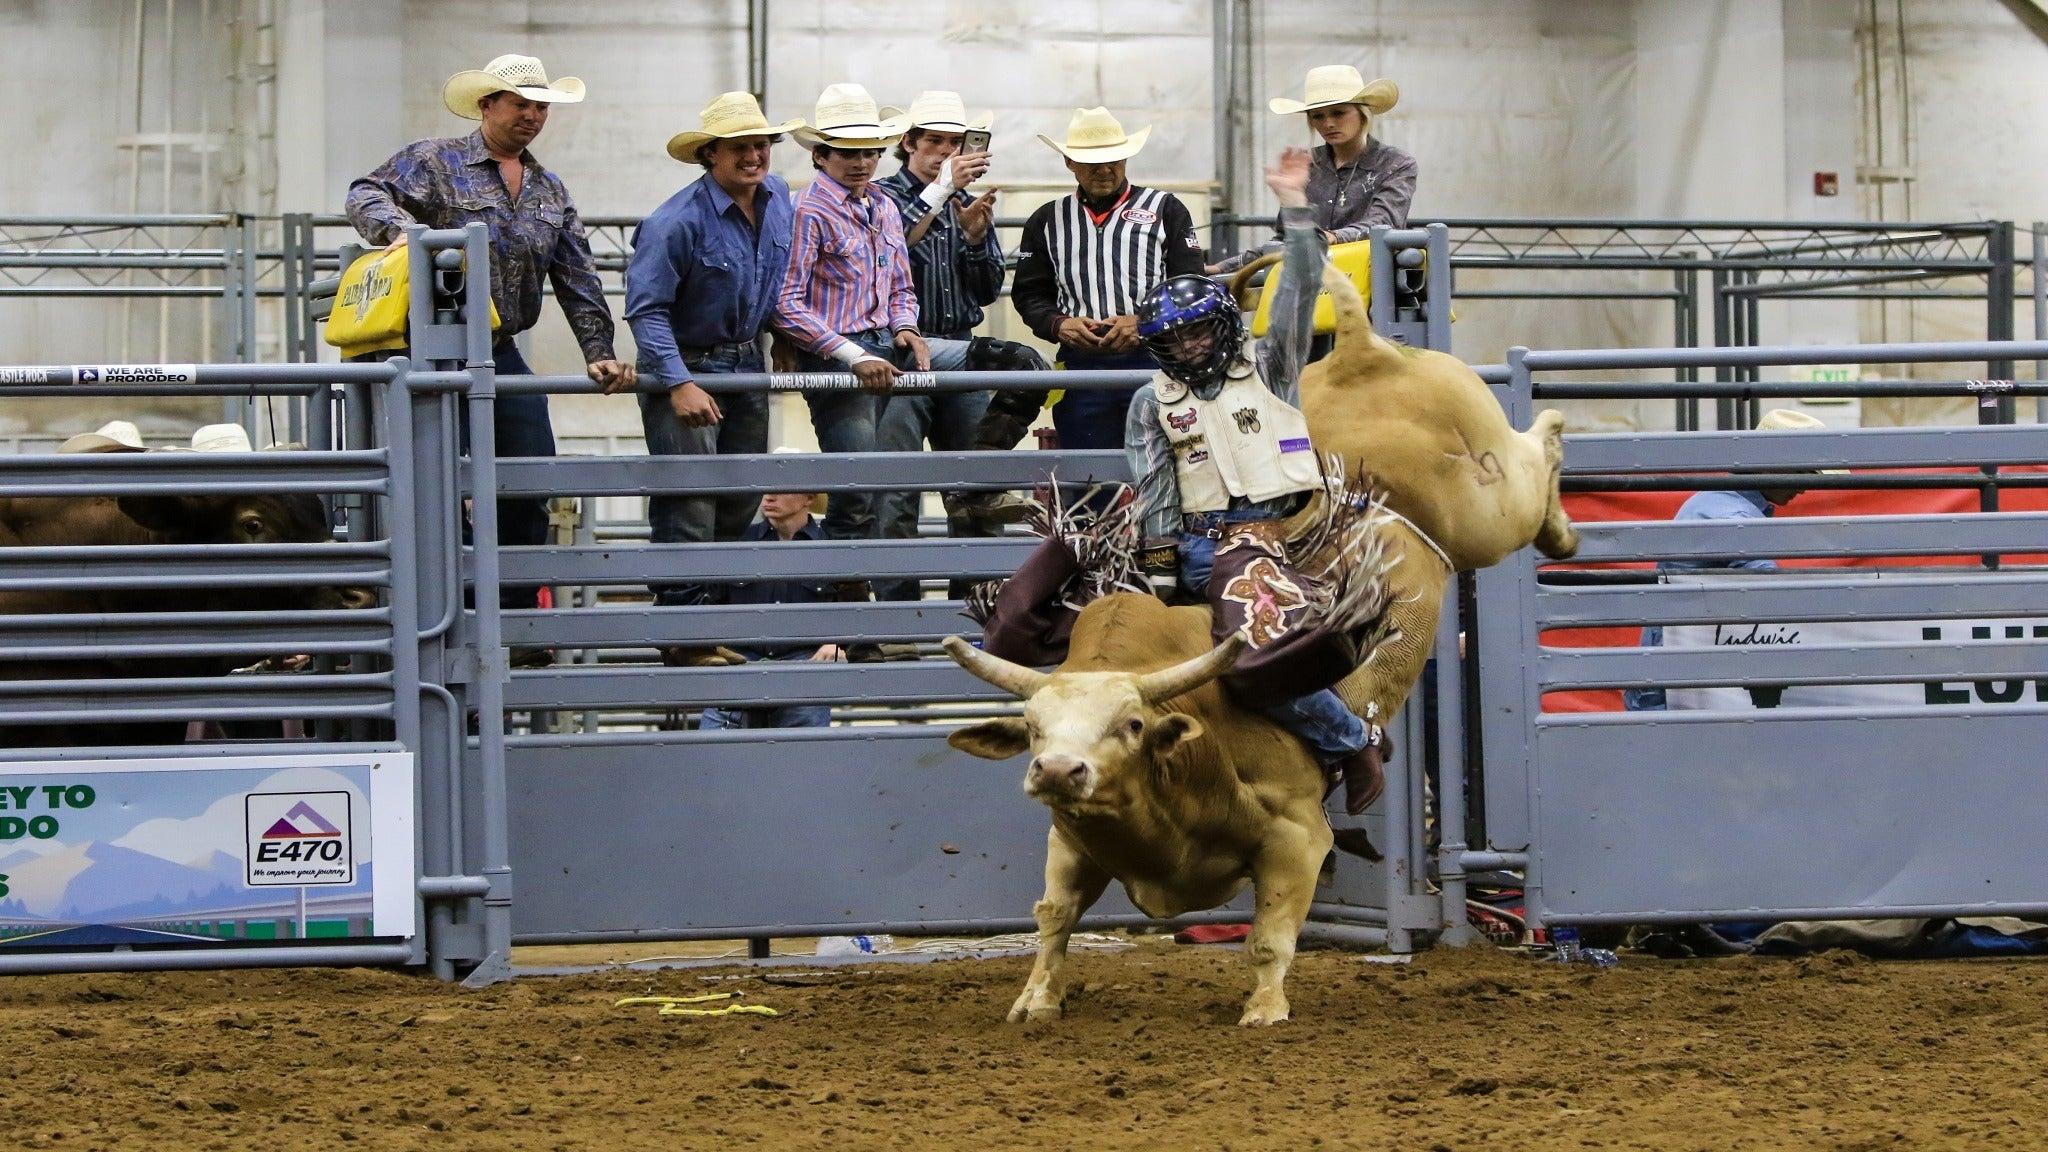 Xtreme Bulls at Douglas County Fairgrounds